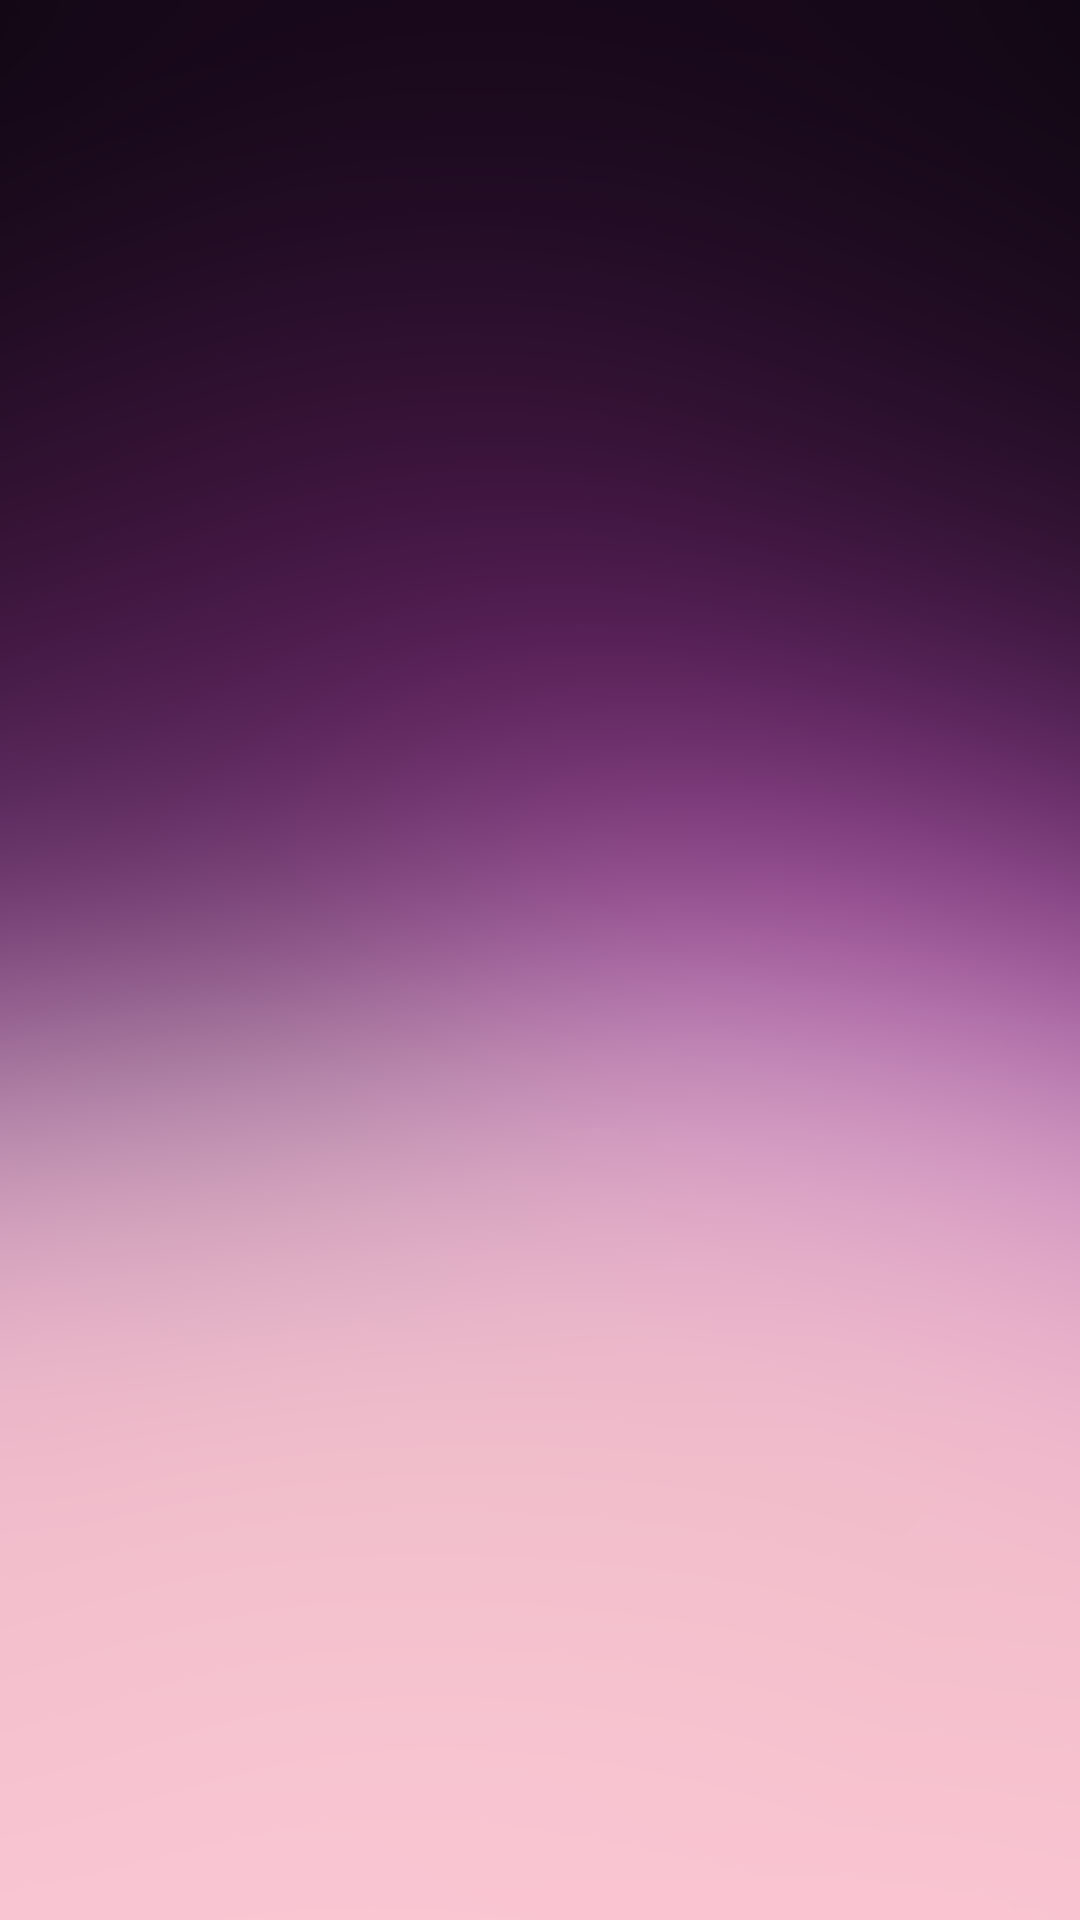 Purple Pink Wallpaper 66 Images